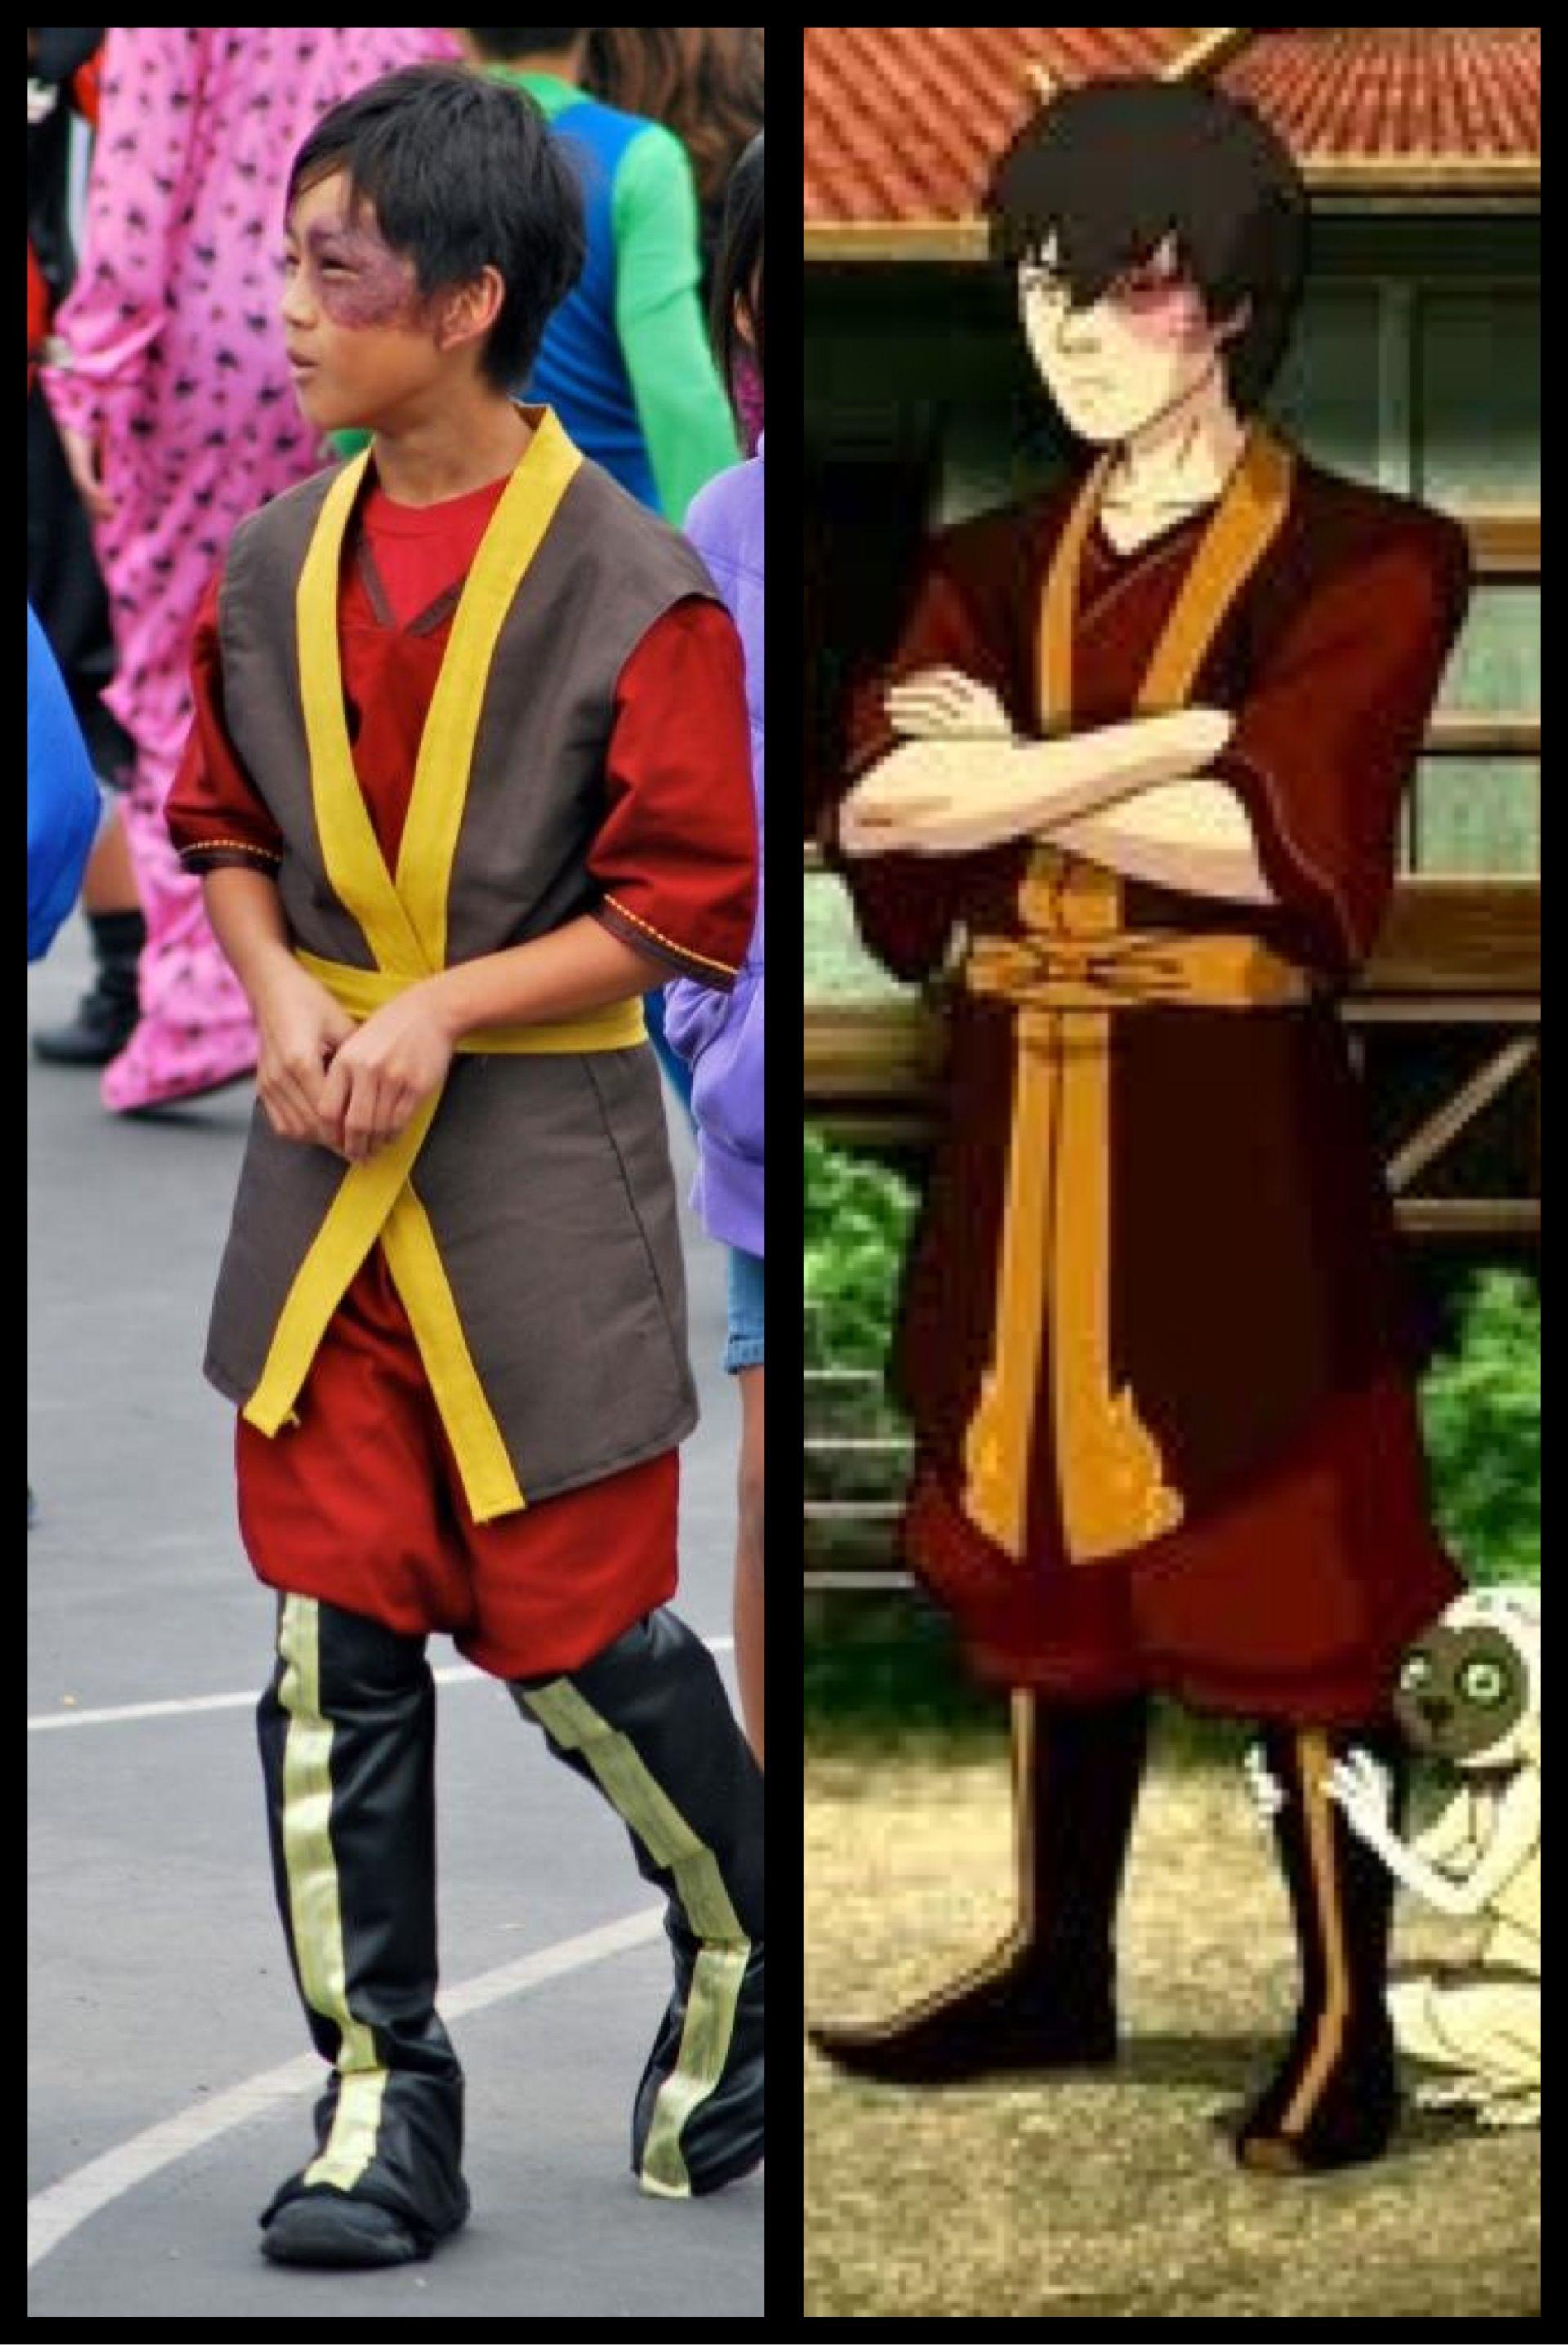 Prince Zuko costume that my son begged me to make.